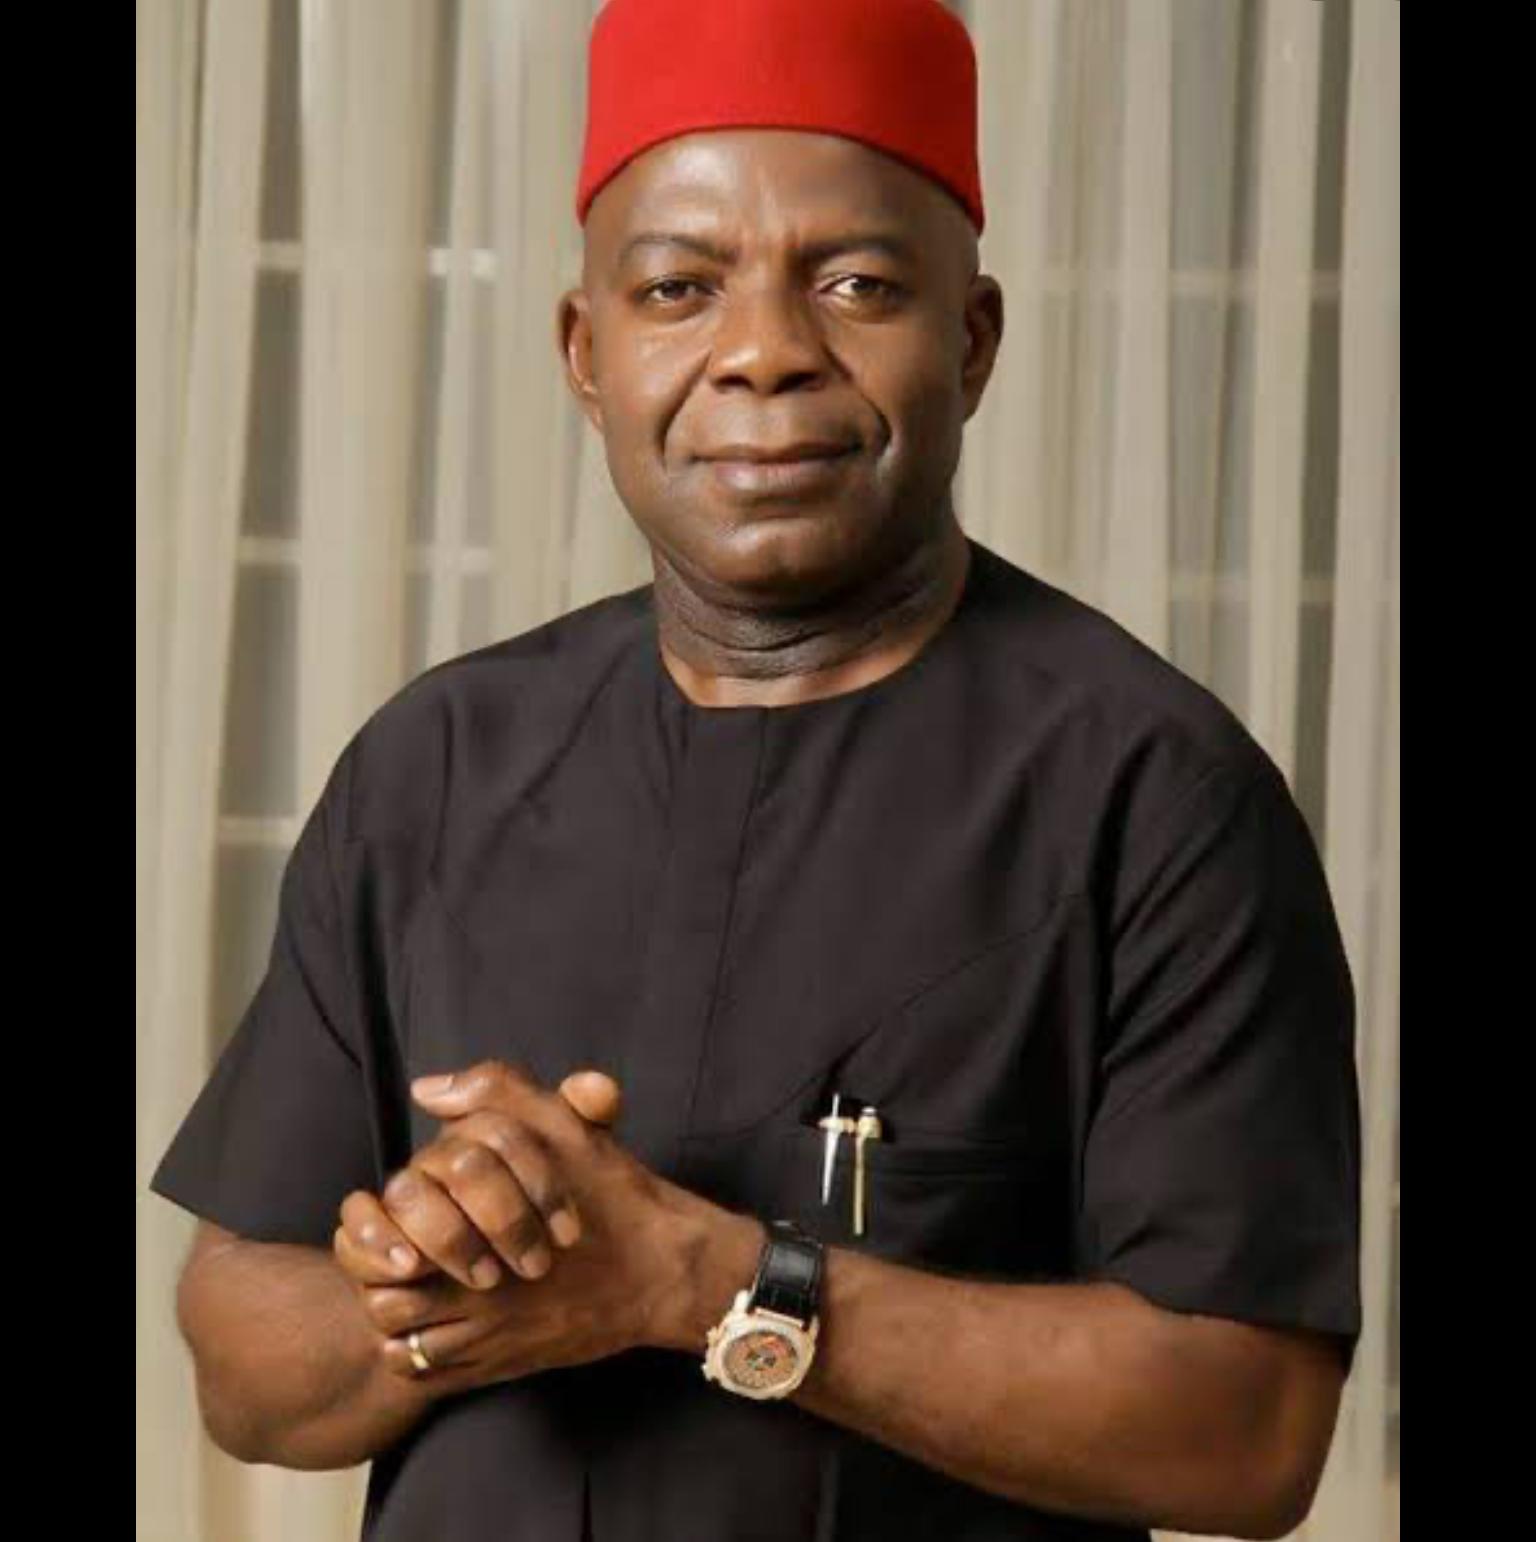 I Don't Think Igbo Presidency Will Solve Nigeria's Problems Says Alex Otti